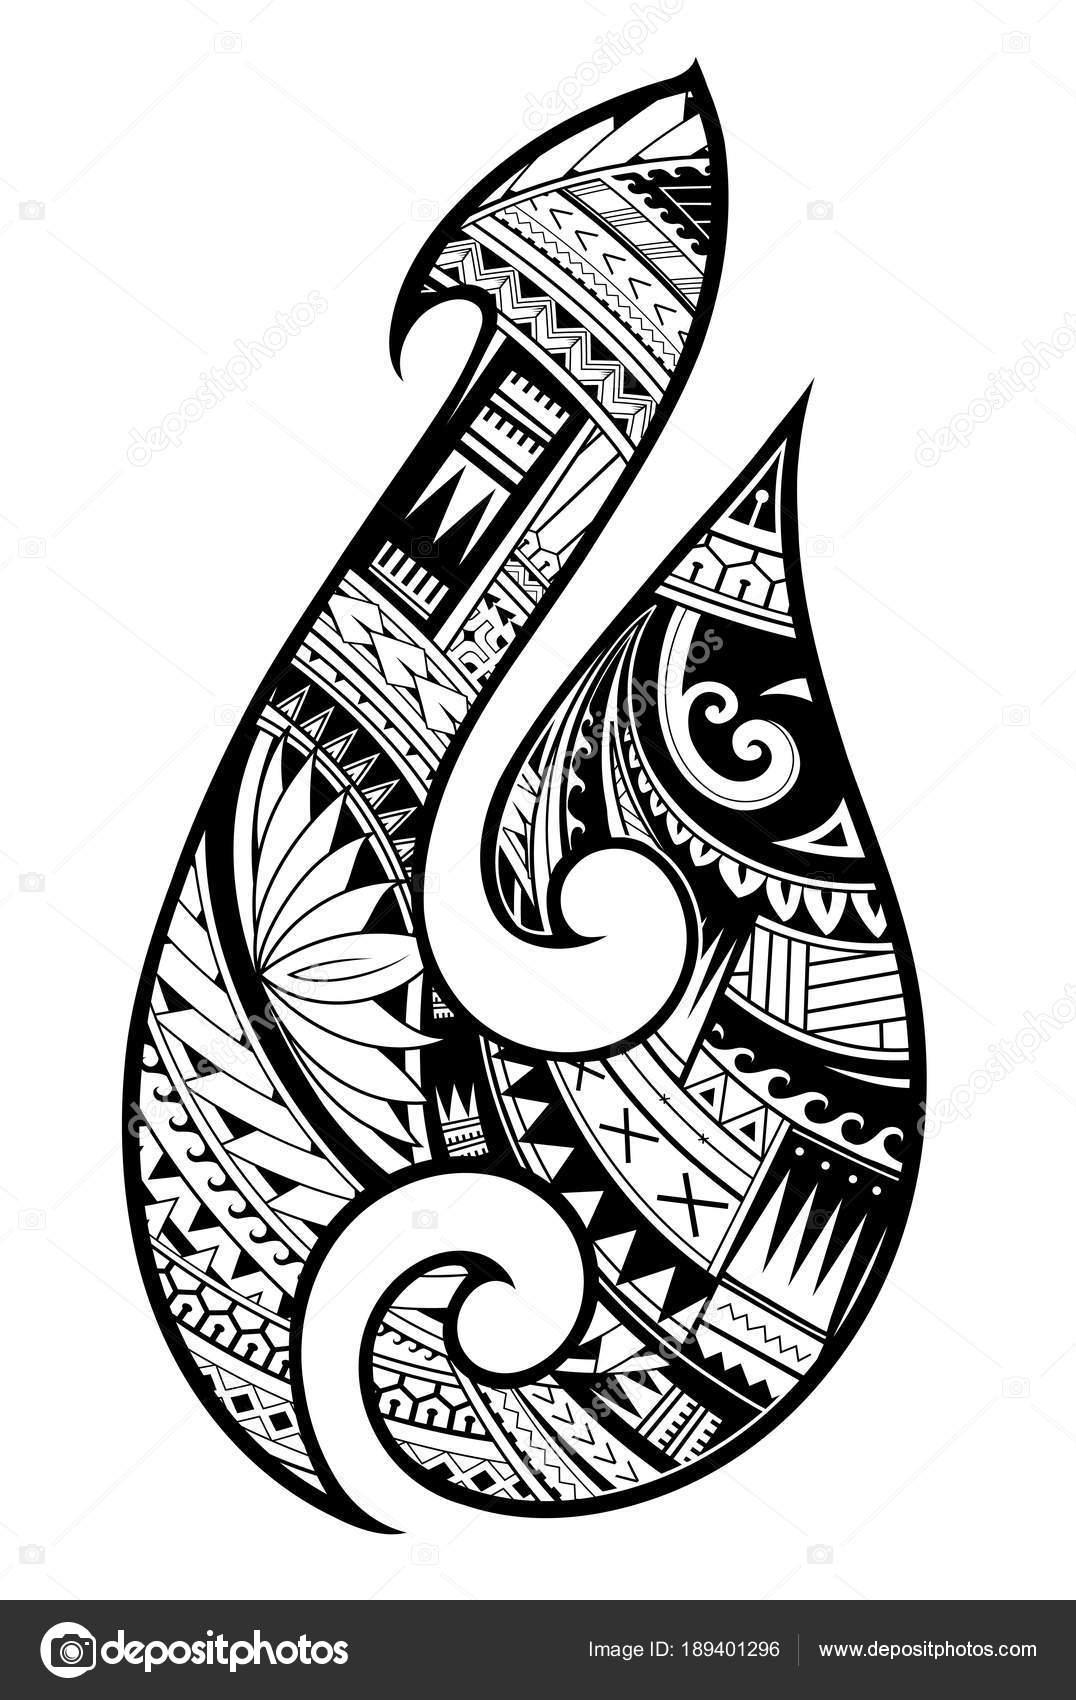 Plantilla Para Tatuajes Maories Maories Del Tatuaje De Estilo - Fotos-de-maories